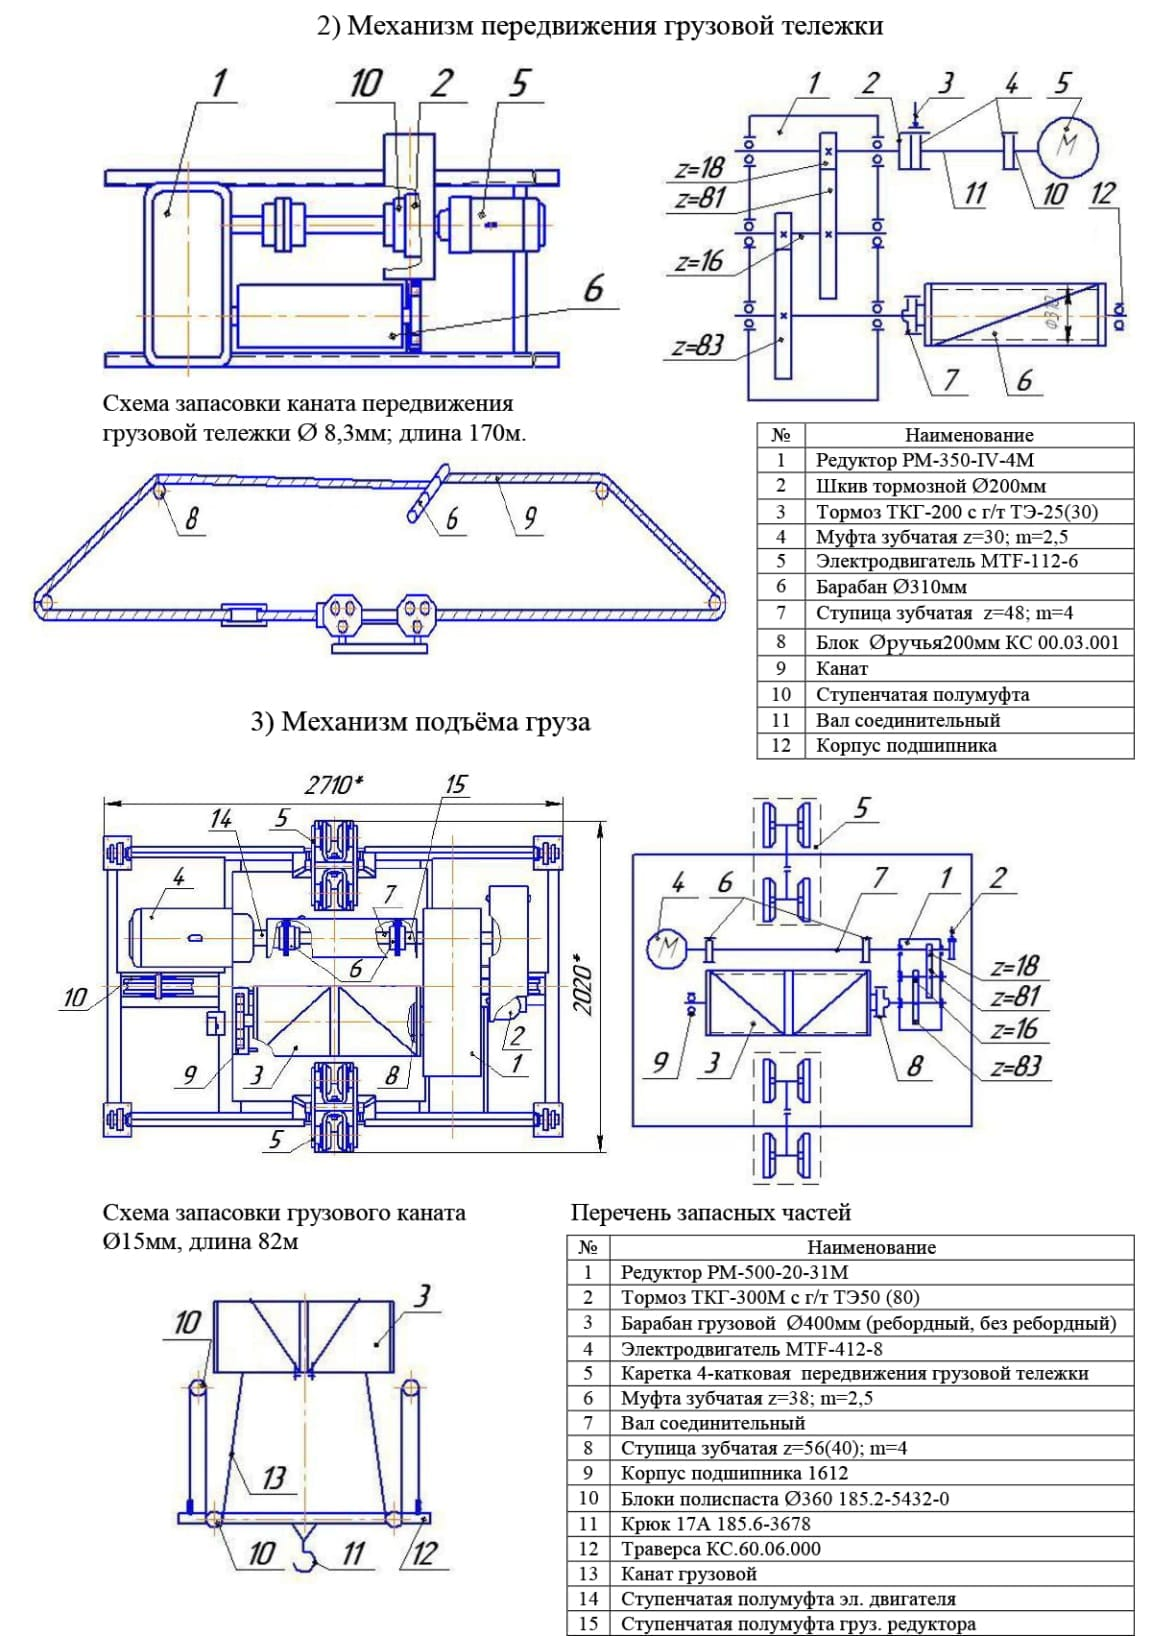 Схема передвижения тележки